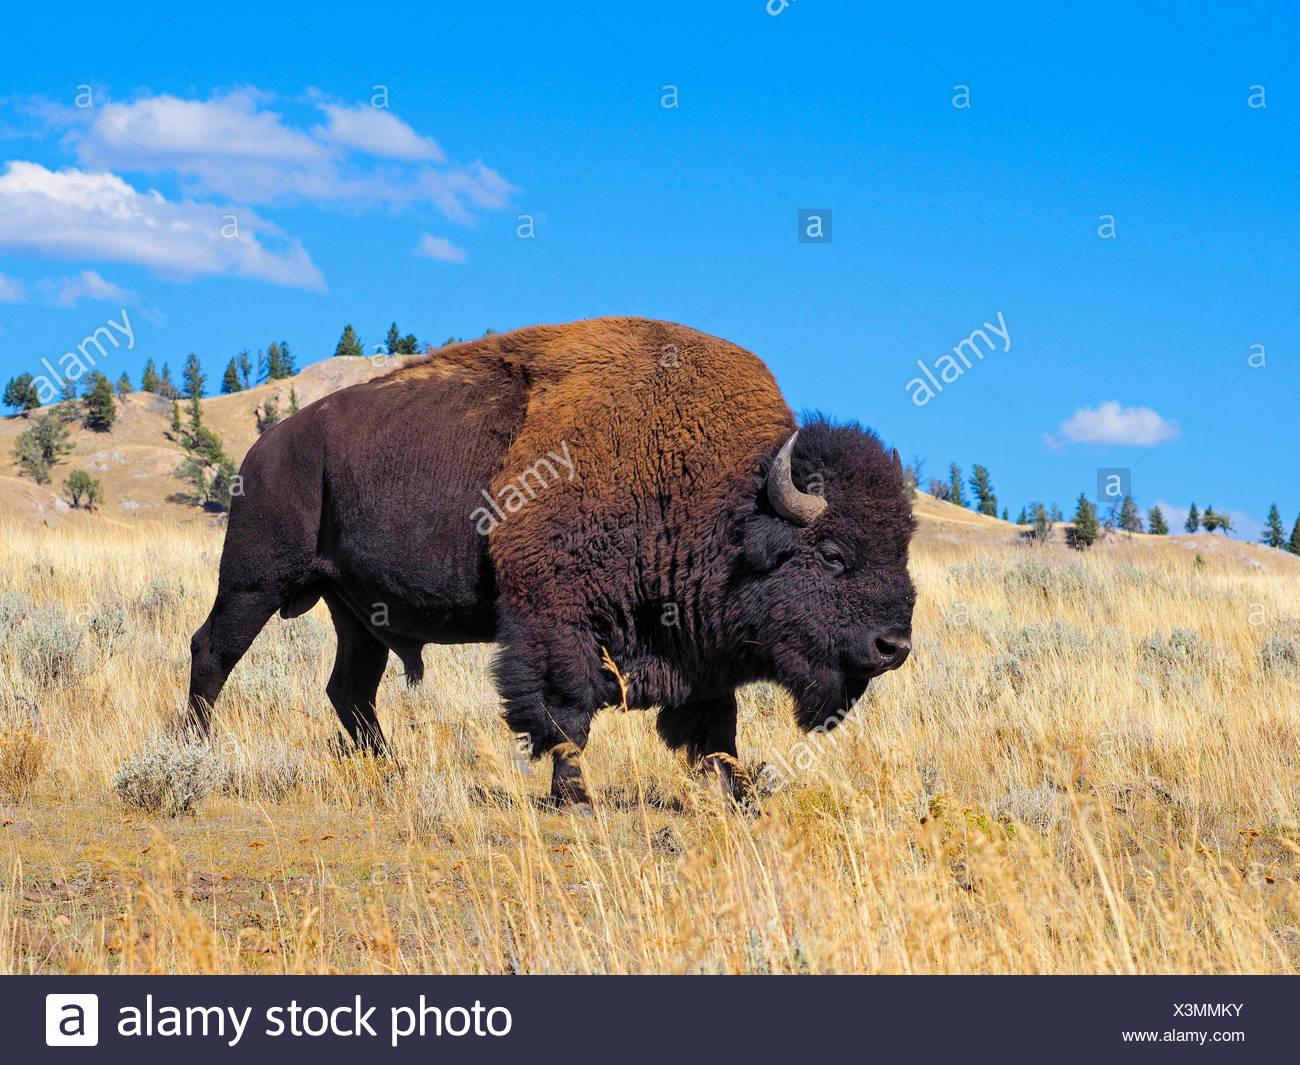 American bison, buffalo (Bison bison), male buffalo, USA, Wyoming, Yellowstone National Park, Lamar Valley - Stock Image